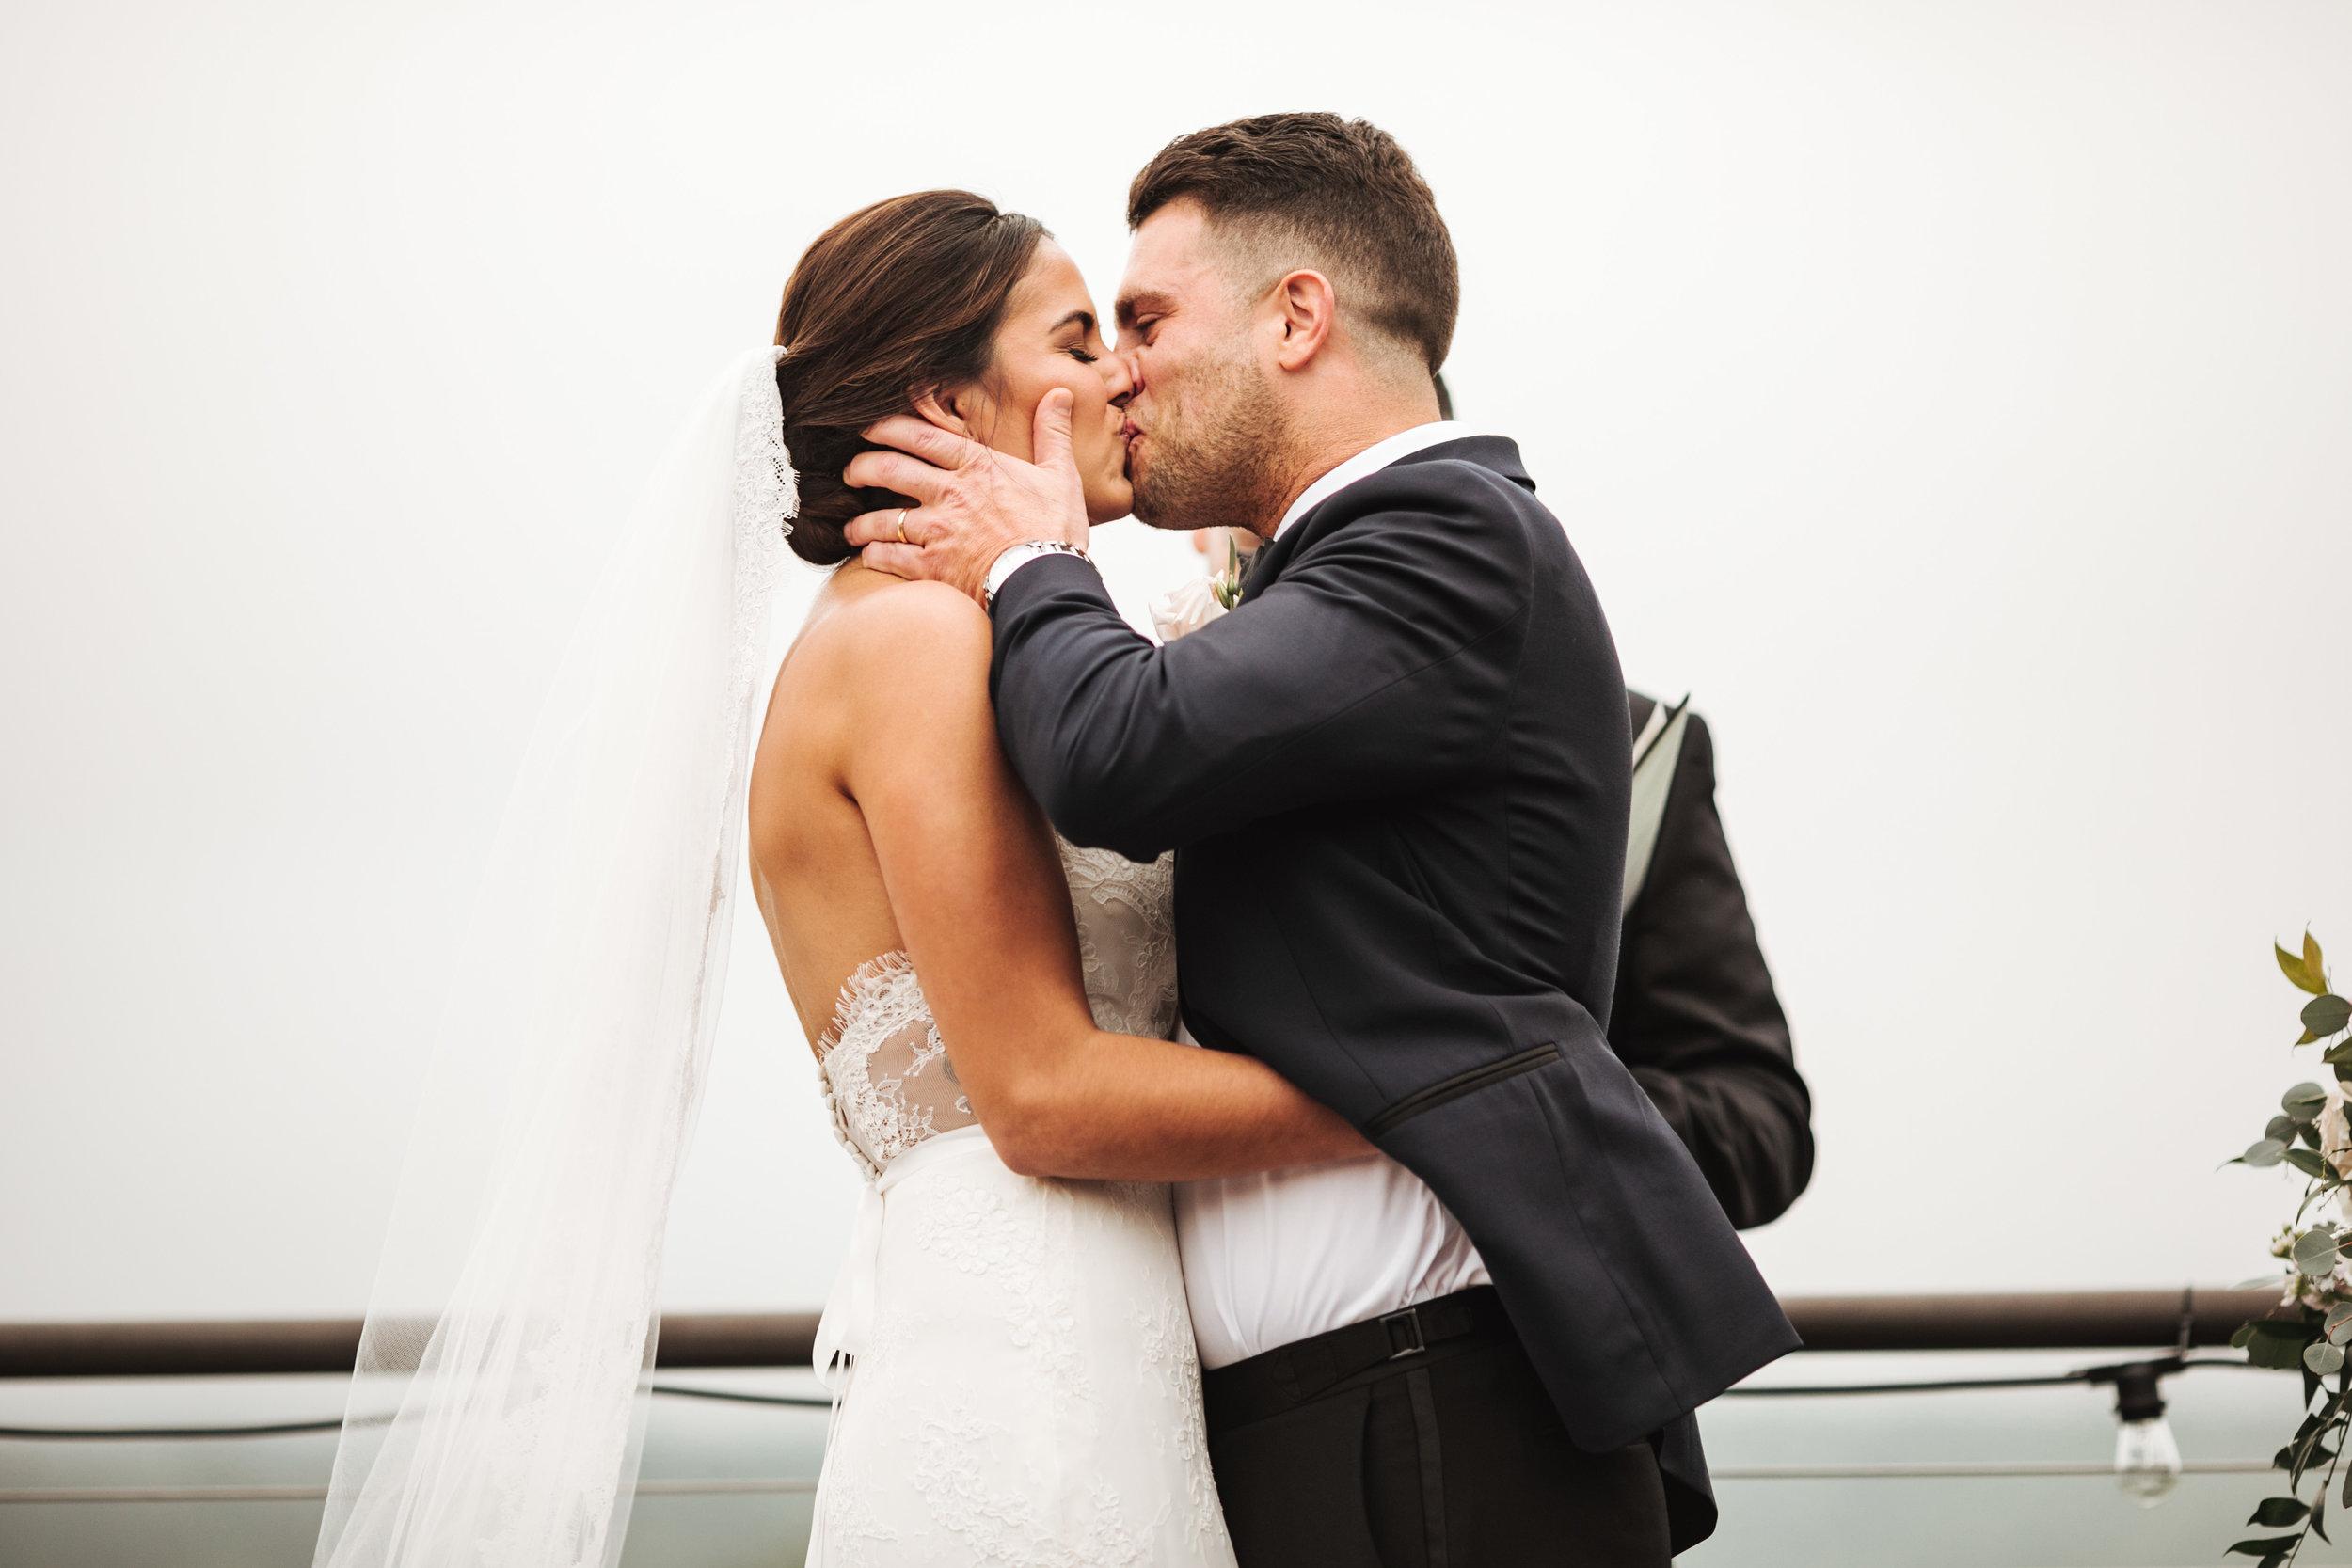 LoPresti Washington DC Wedding Photographer Mioara Dragan Photography Prev 0064 -Edit.JPG